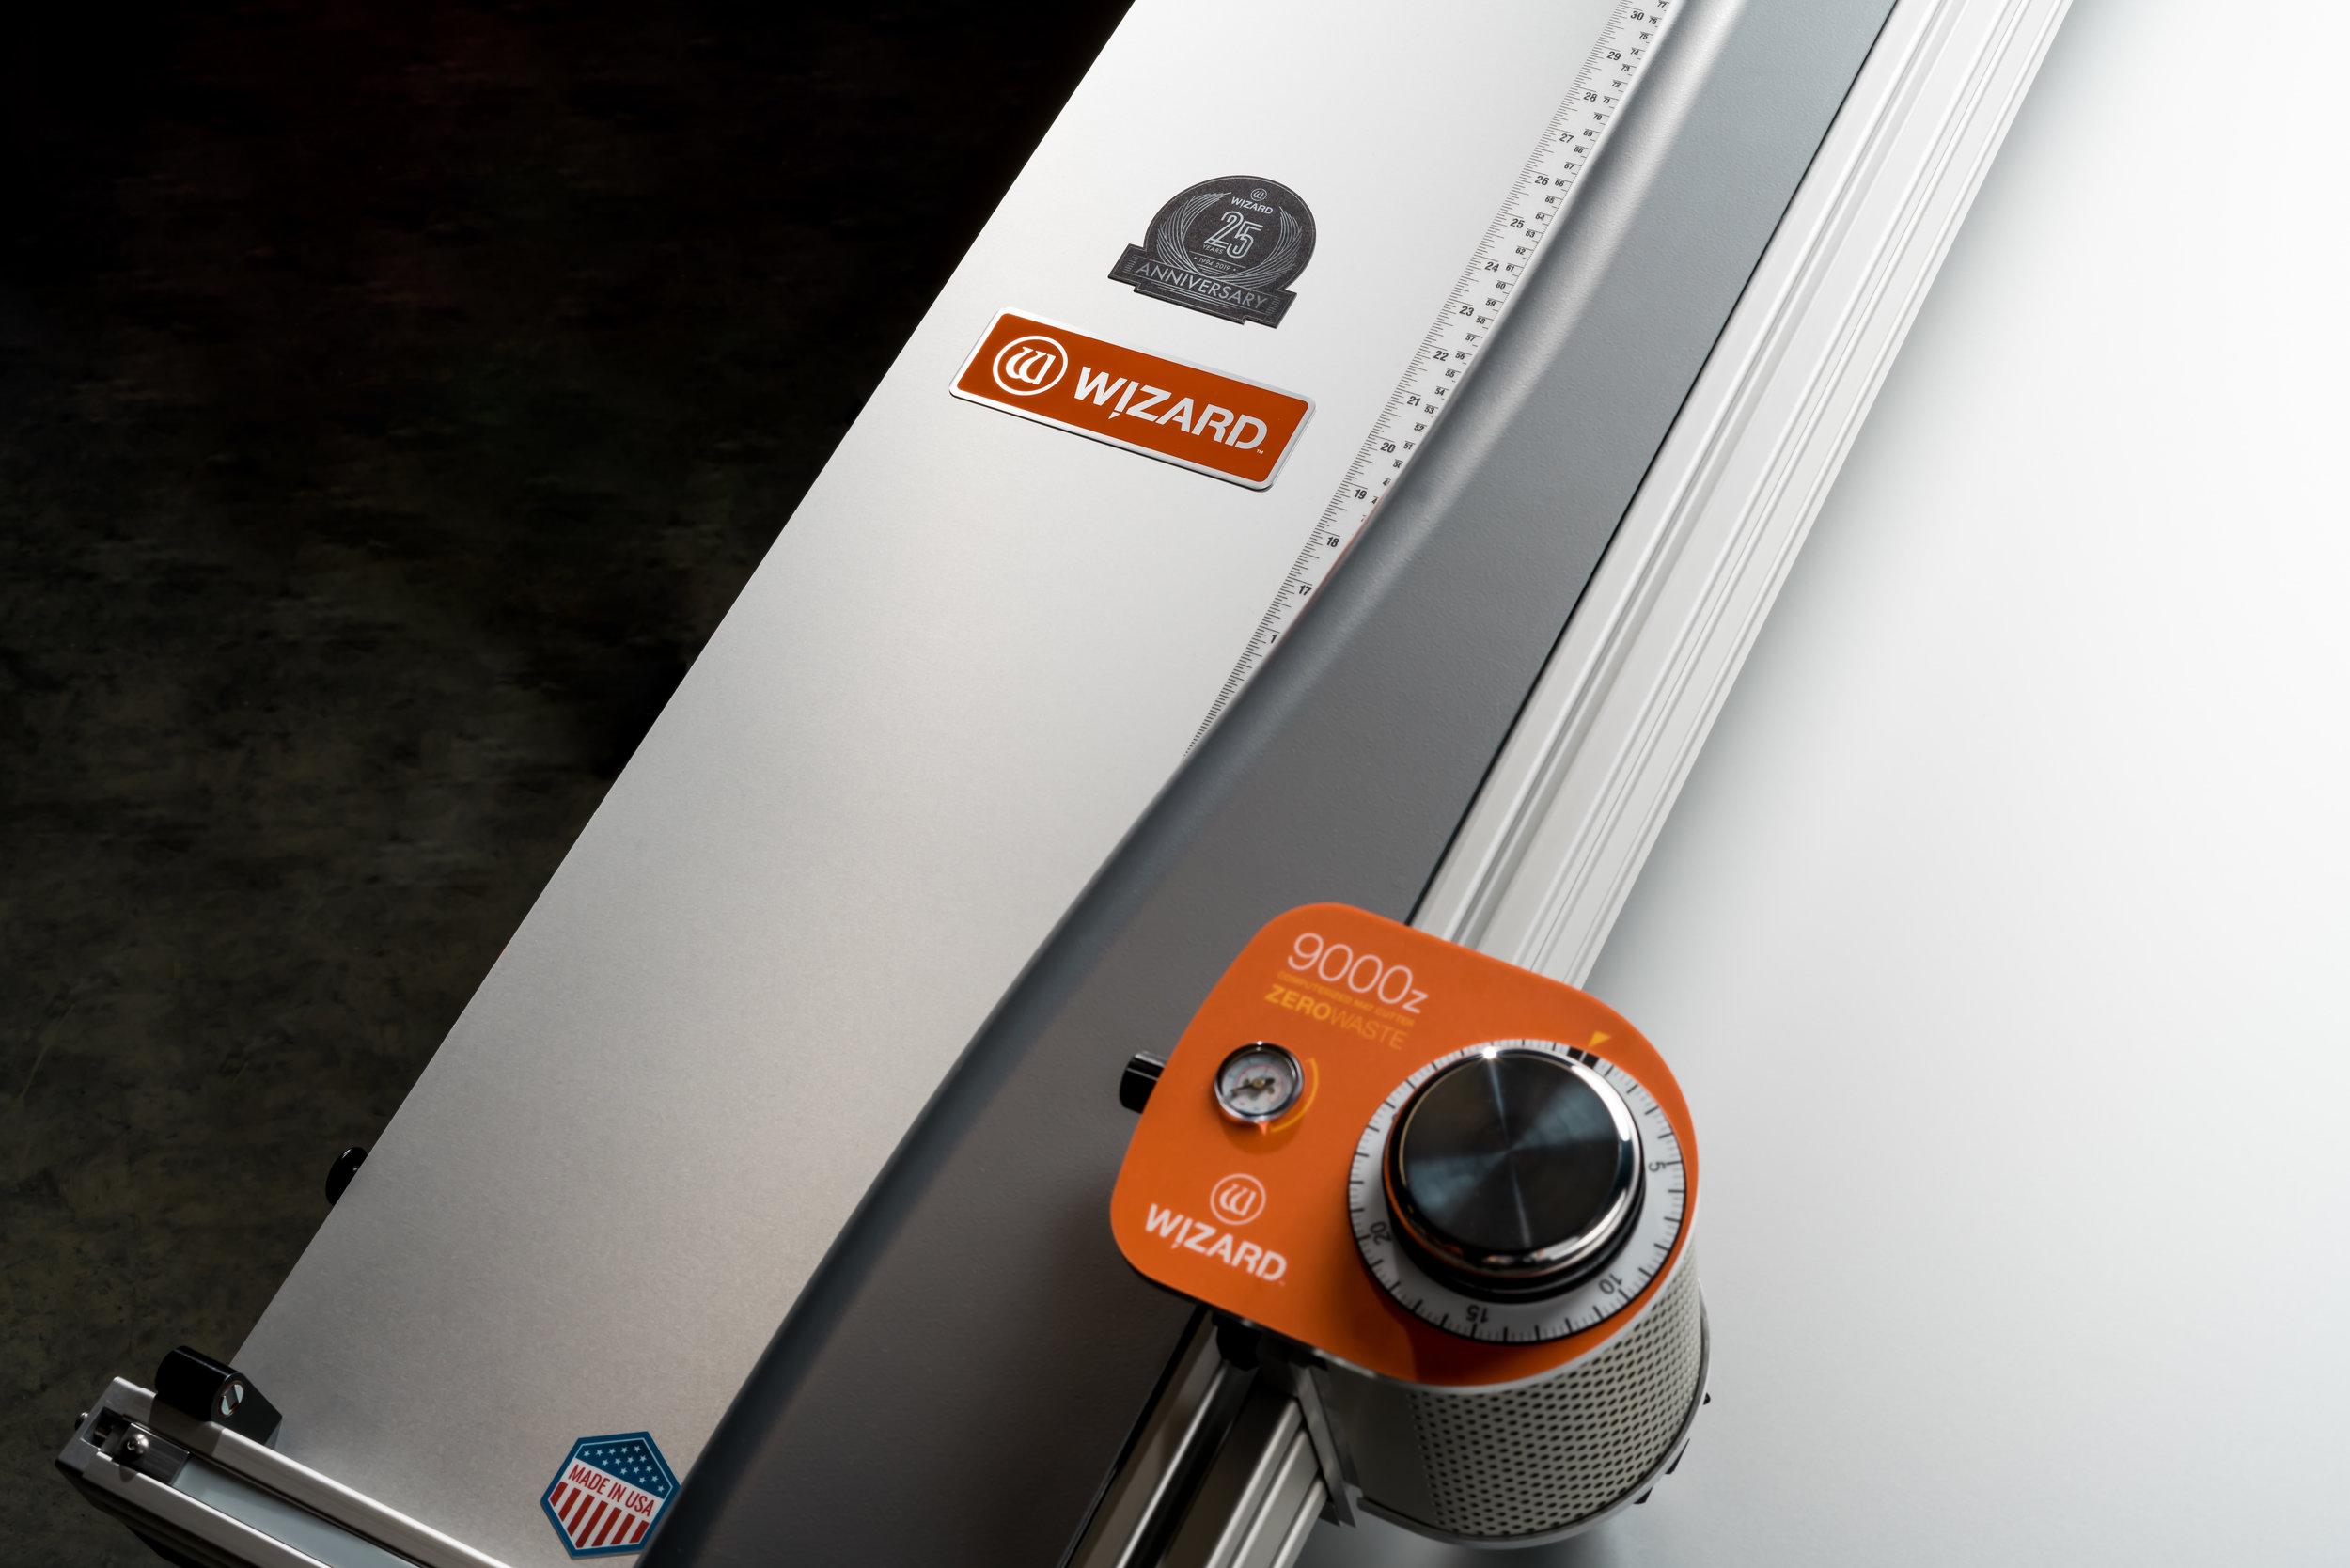 9000z-Closeup-Angle-View.jpg